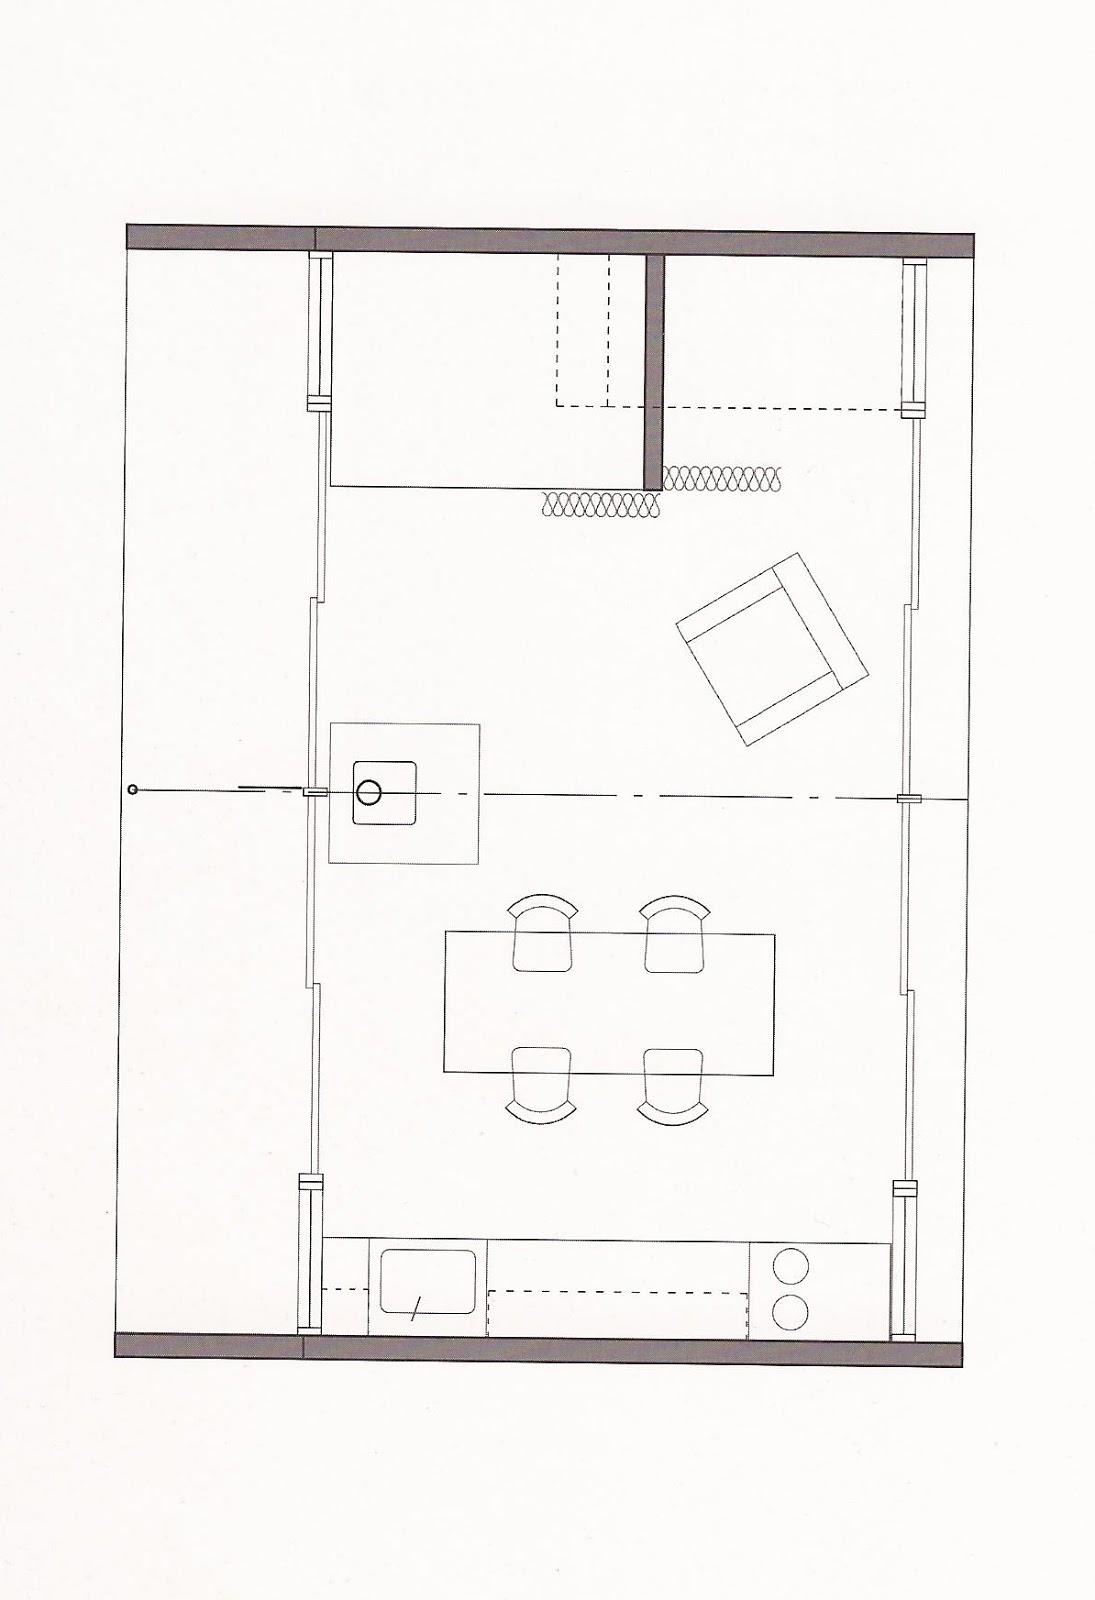 Bim detroit prototype and community plan development for Prototype house plan